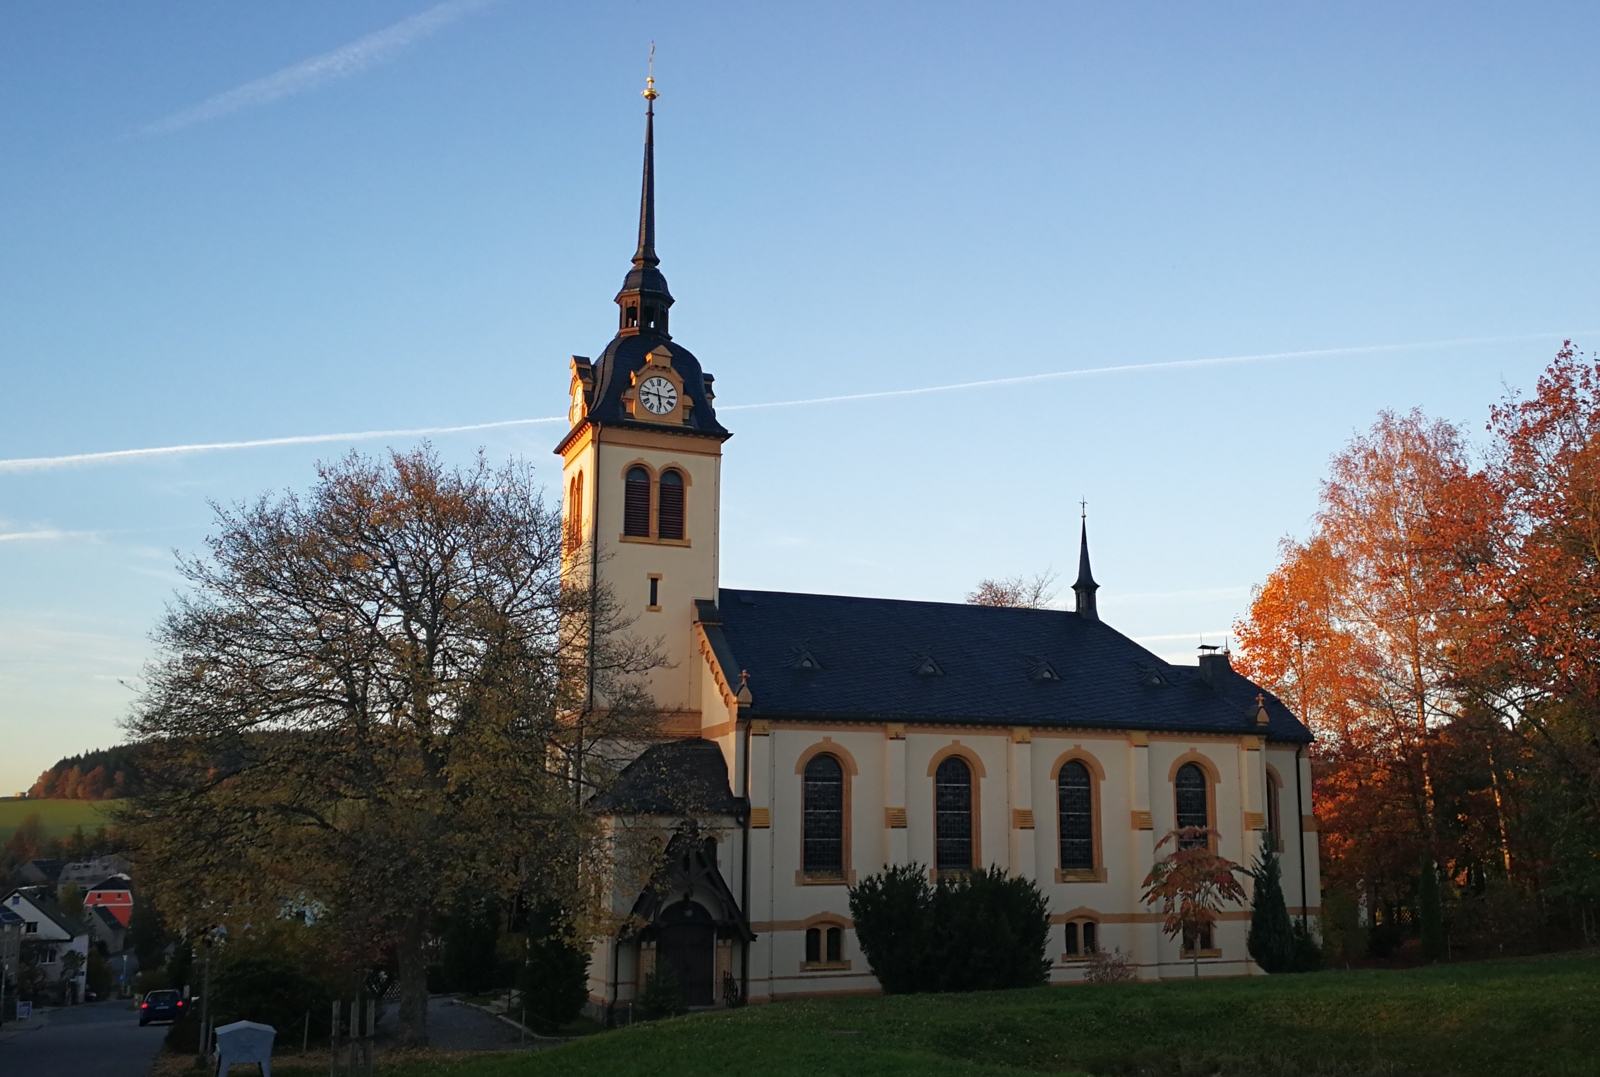 Kirche in Börnichen